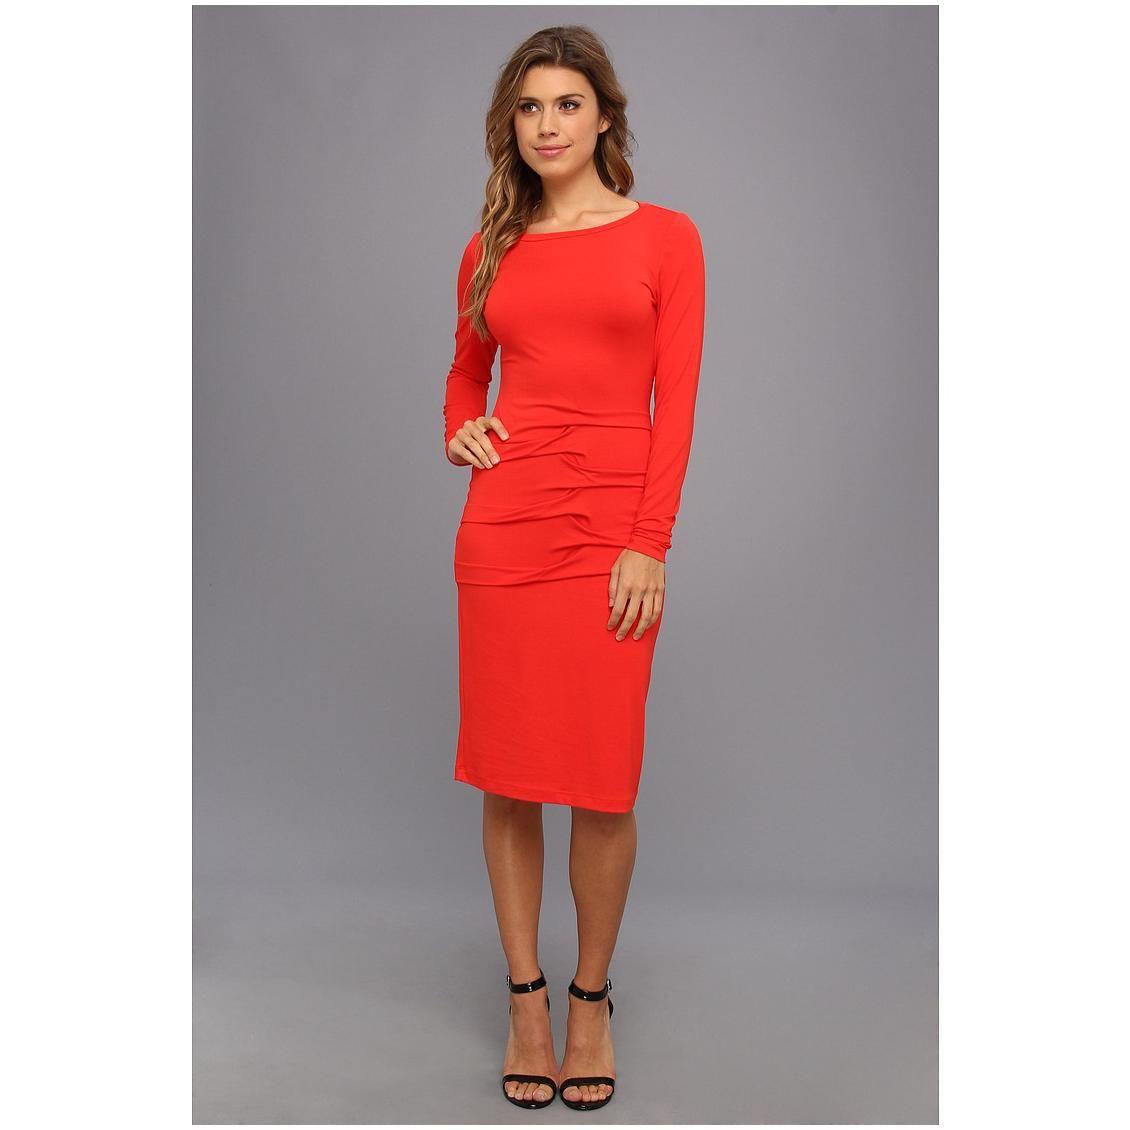 Cheap red ruffle front longsleeve mini dress wholesale at dearlover